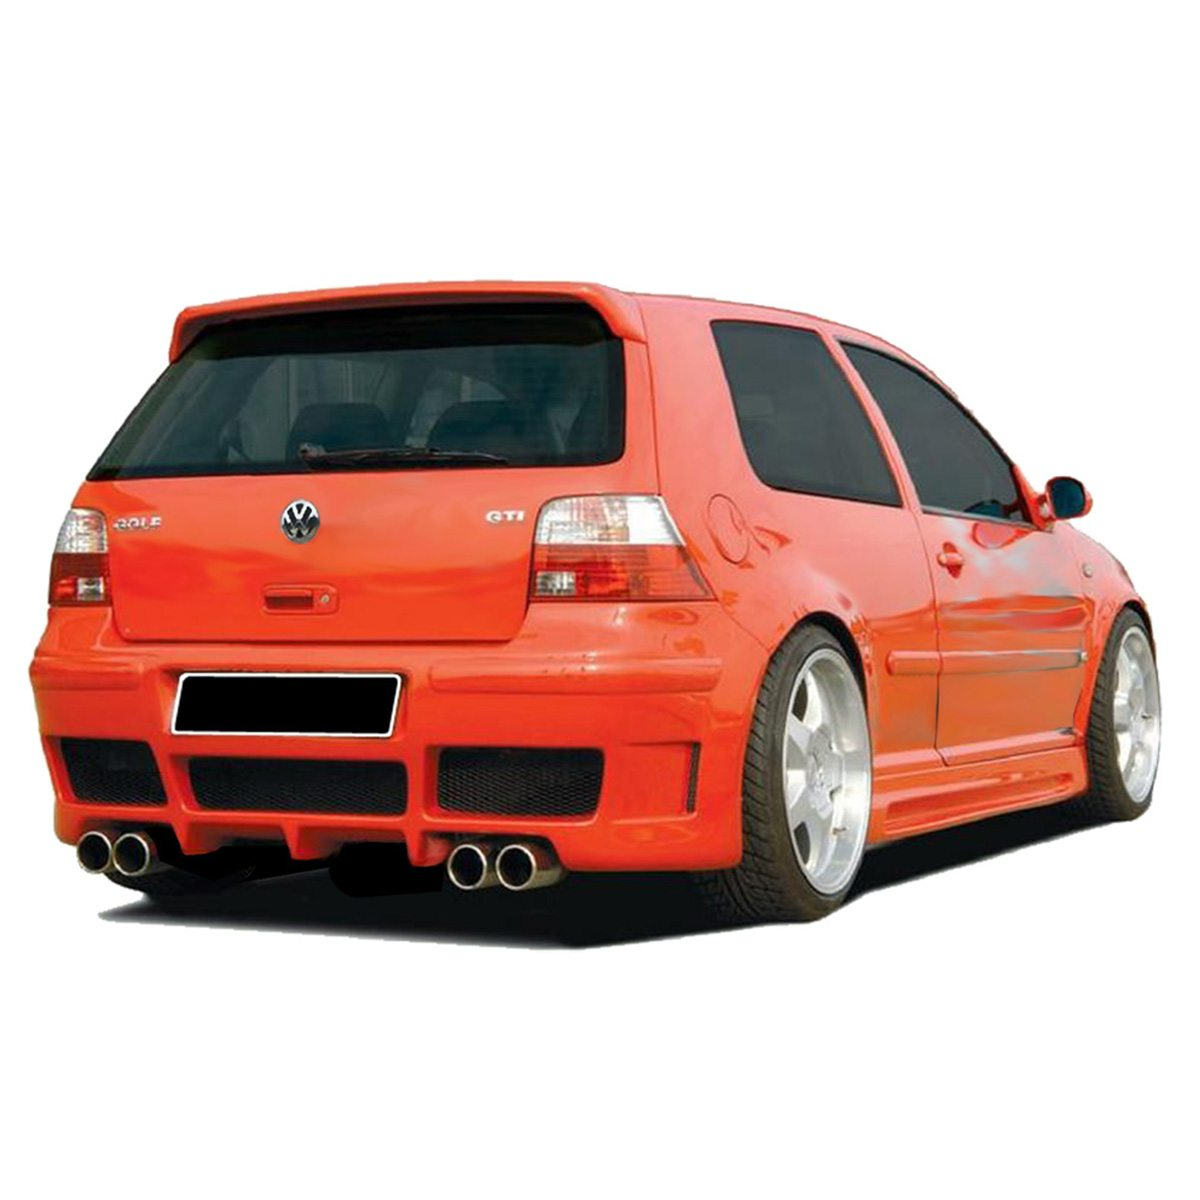 VW-Golf-IV-Tras-PCM051